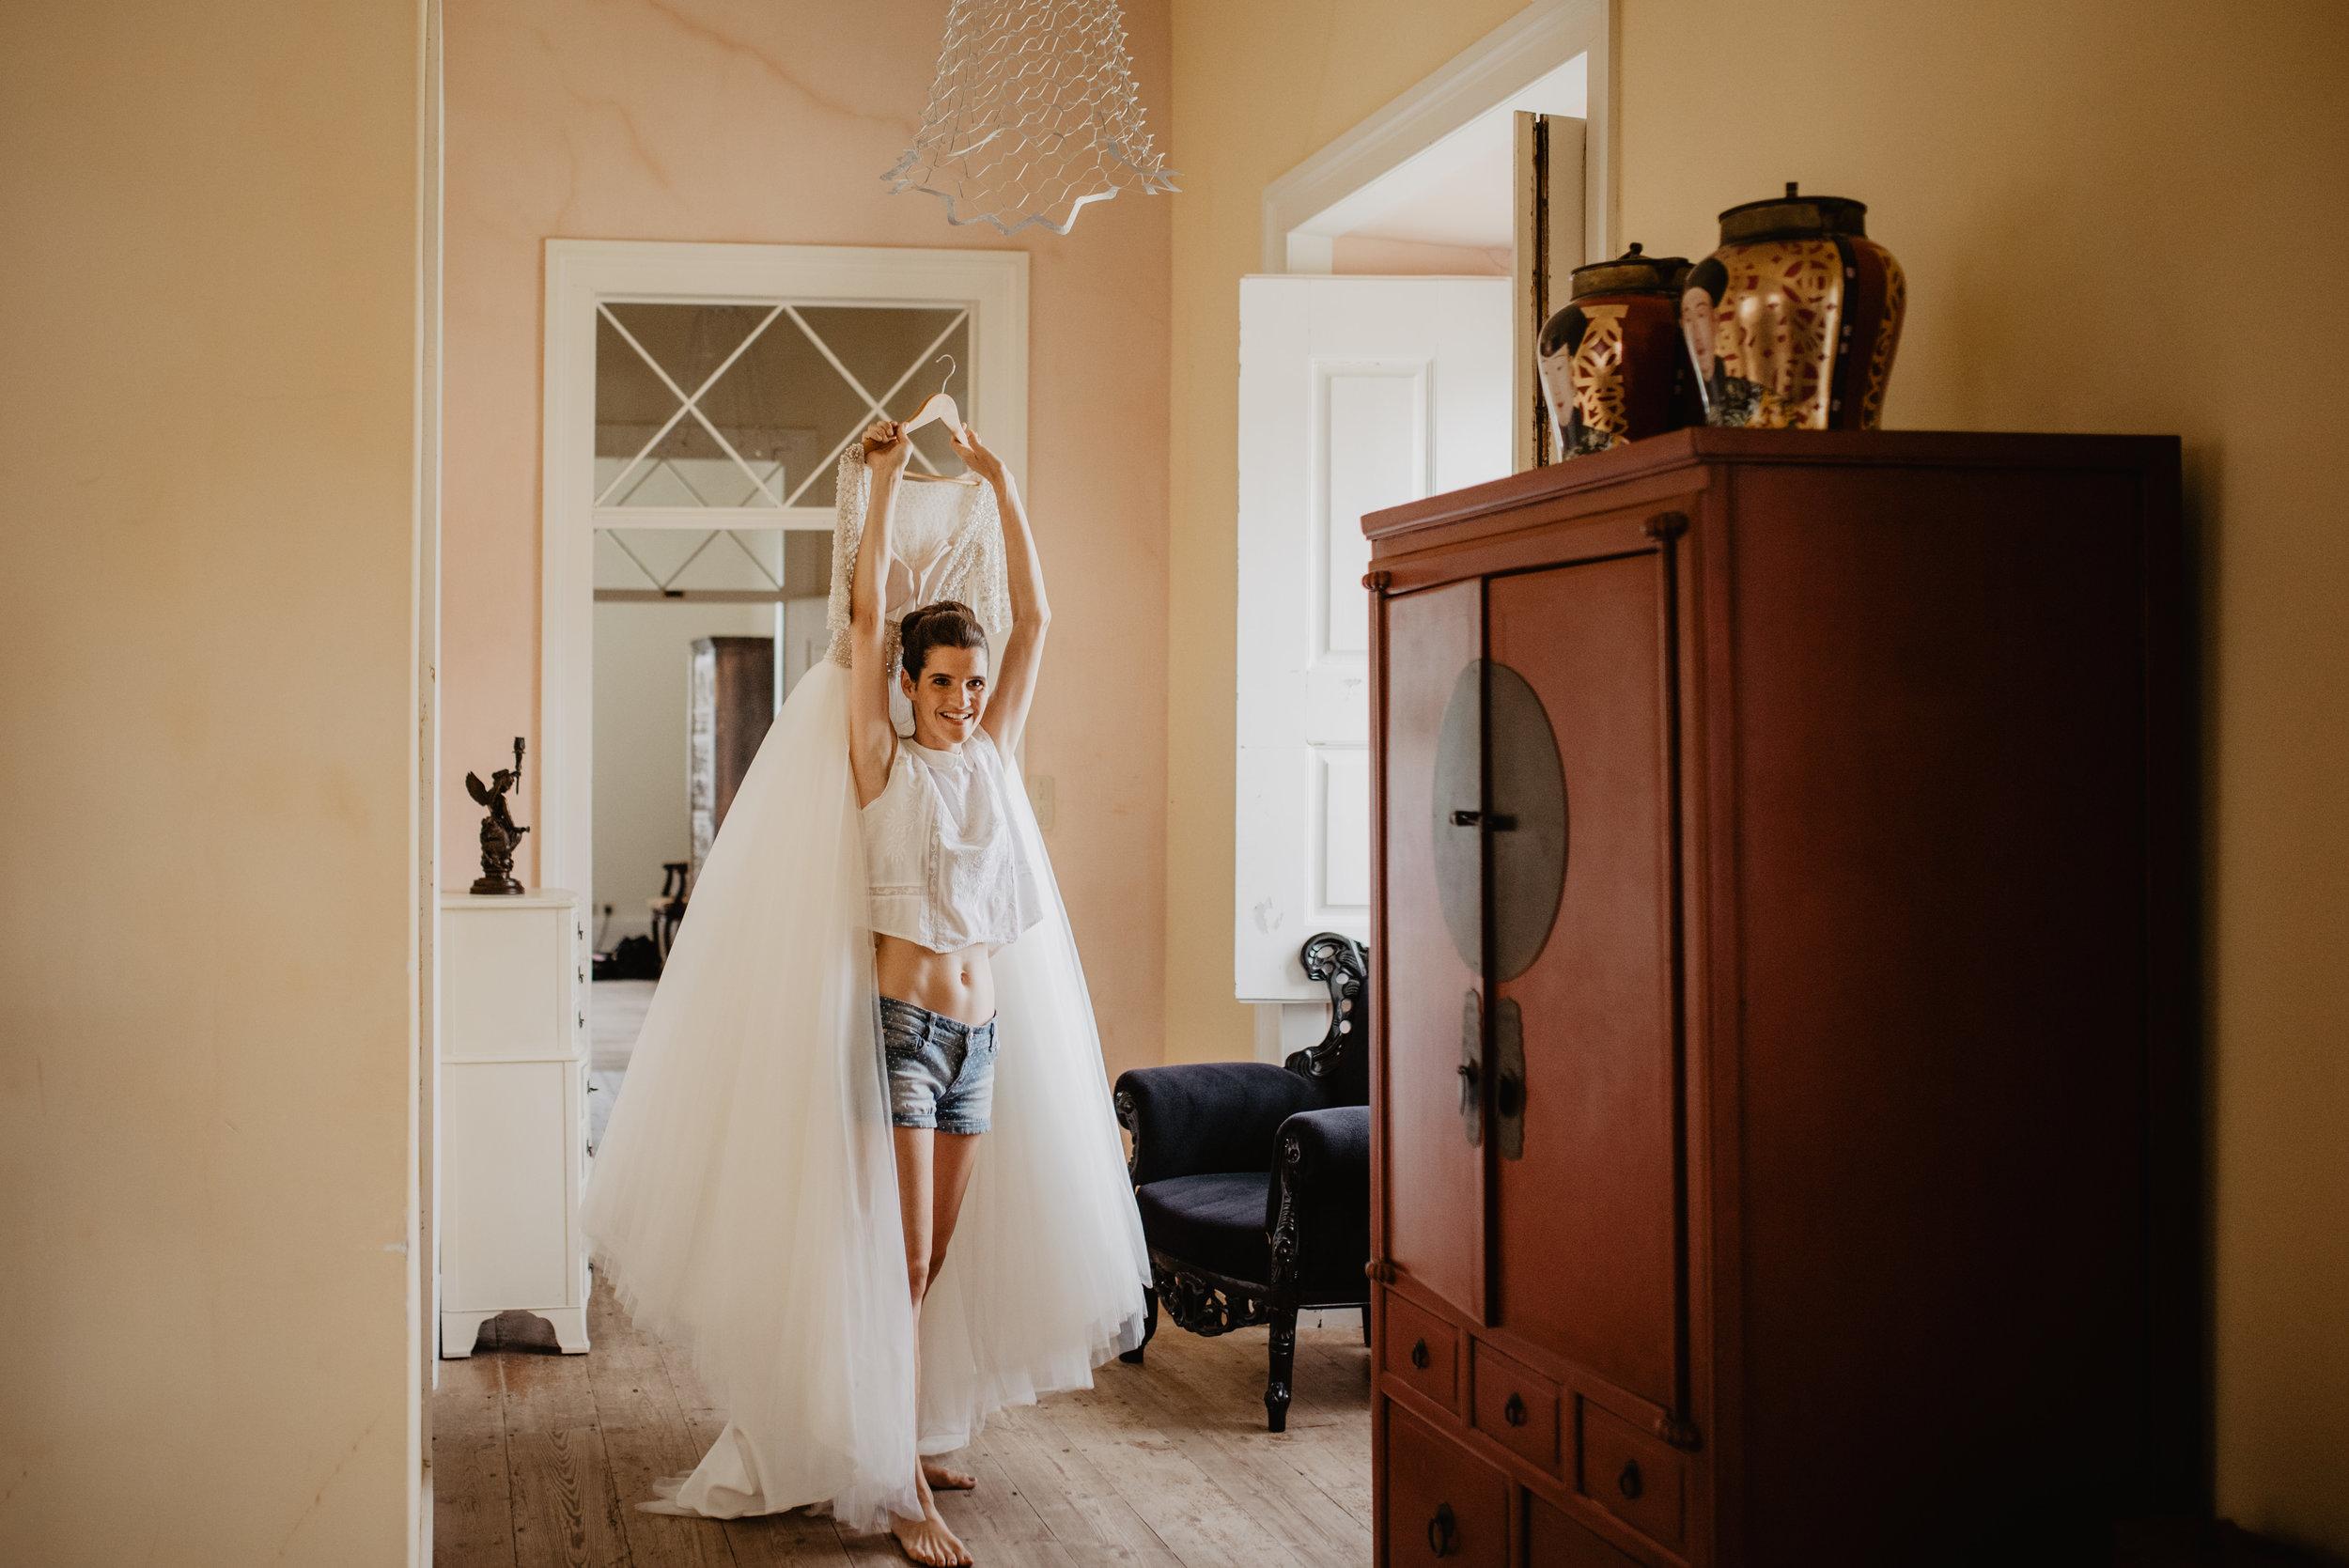 Lapela-photography-wedding-sintra-portugal-23.jpg